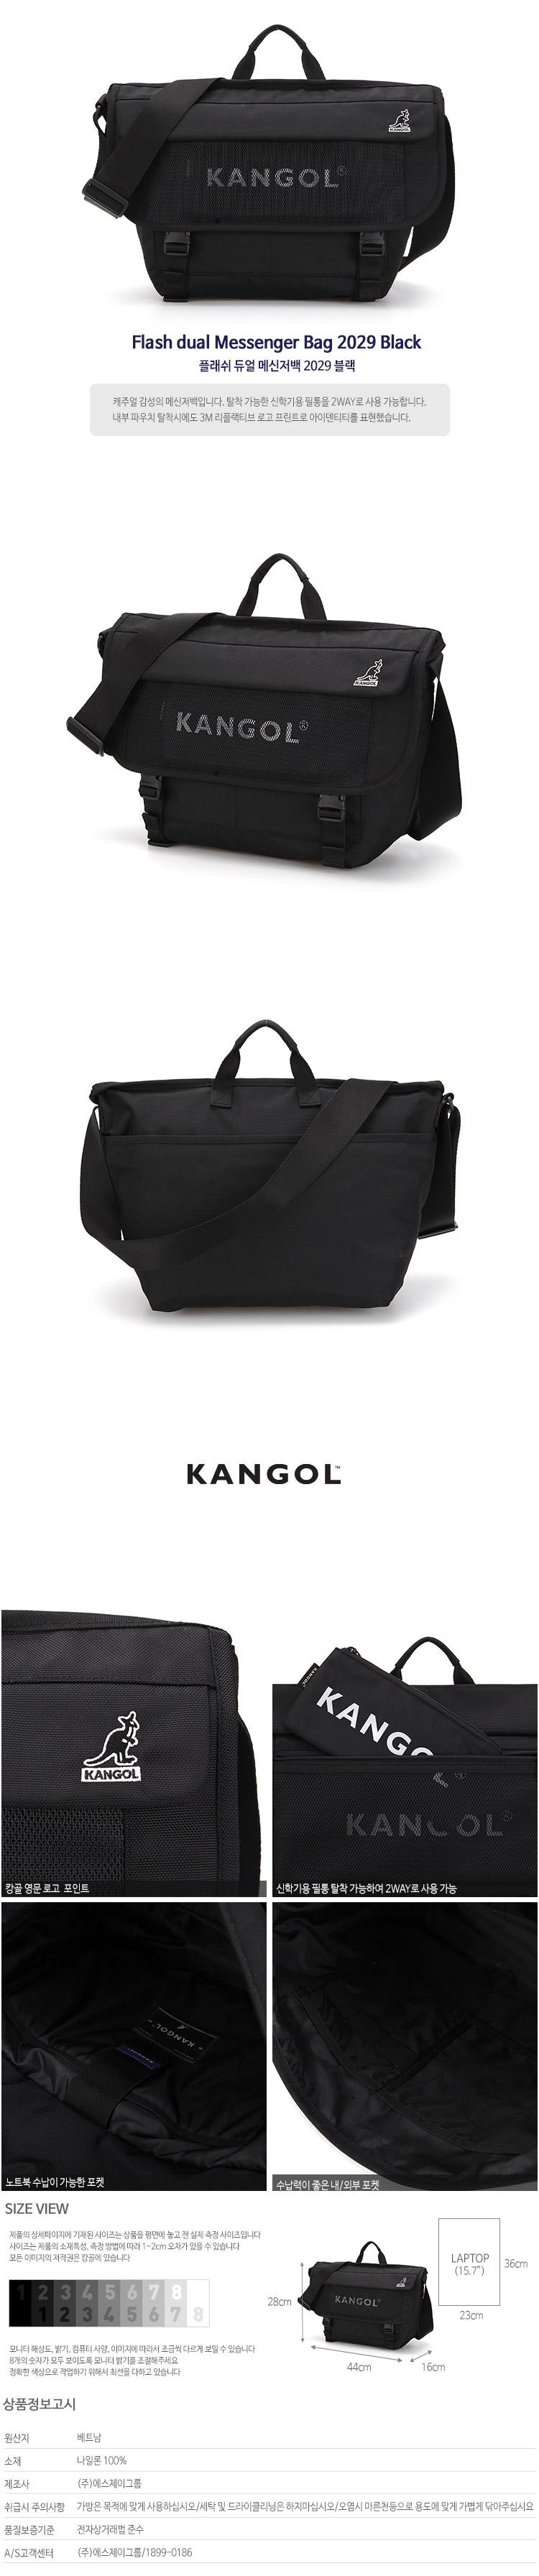 Flash dual Messenger Bag 2029 BLACK